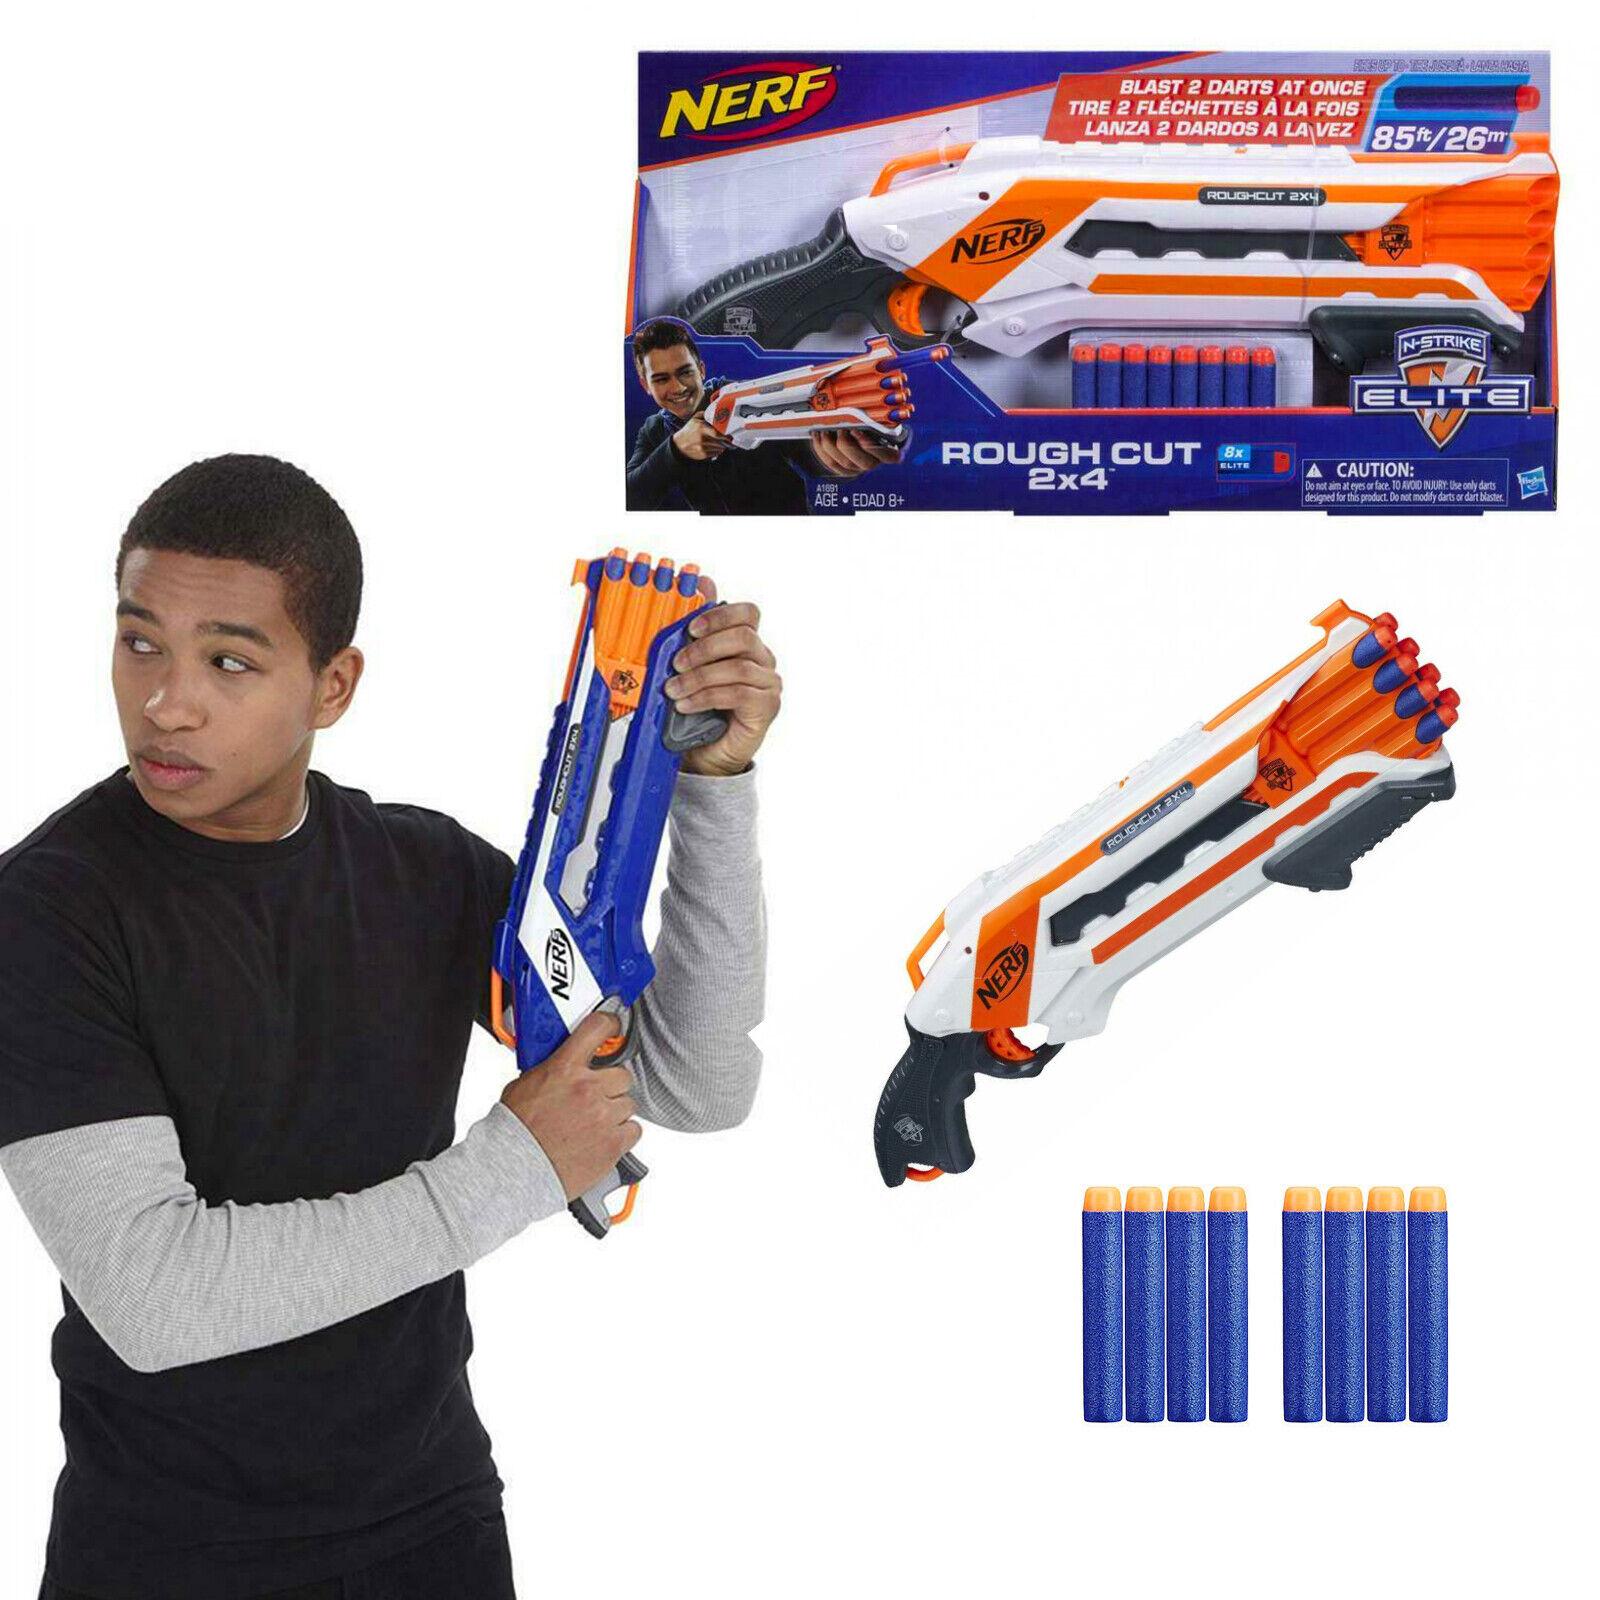 Hasbro Nerf N-Strike Elite Rough Cut - Spielzeugblaster Nerf Gun Darts Pfeile